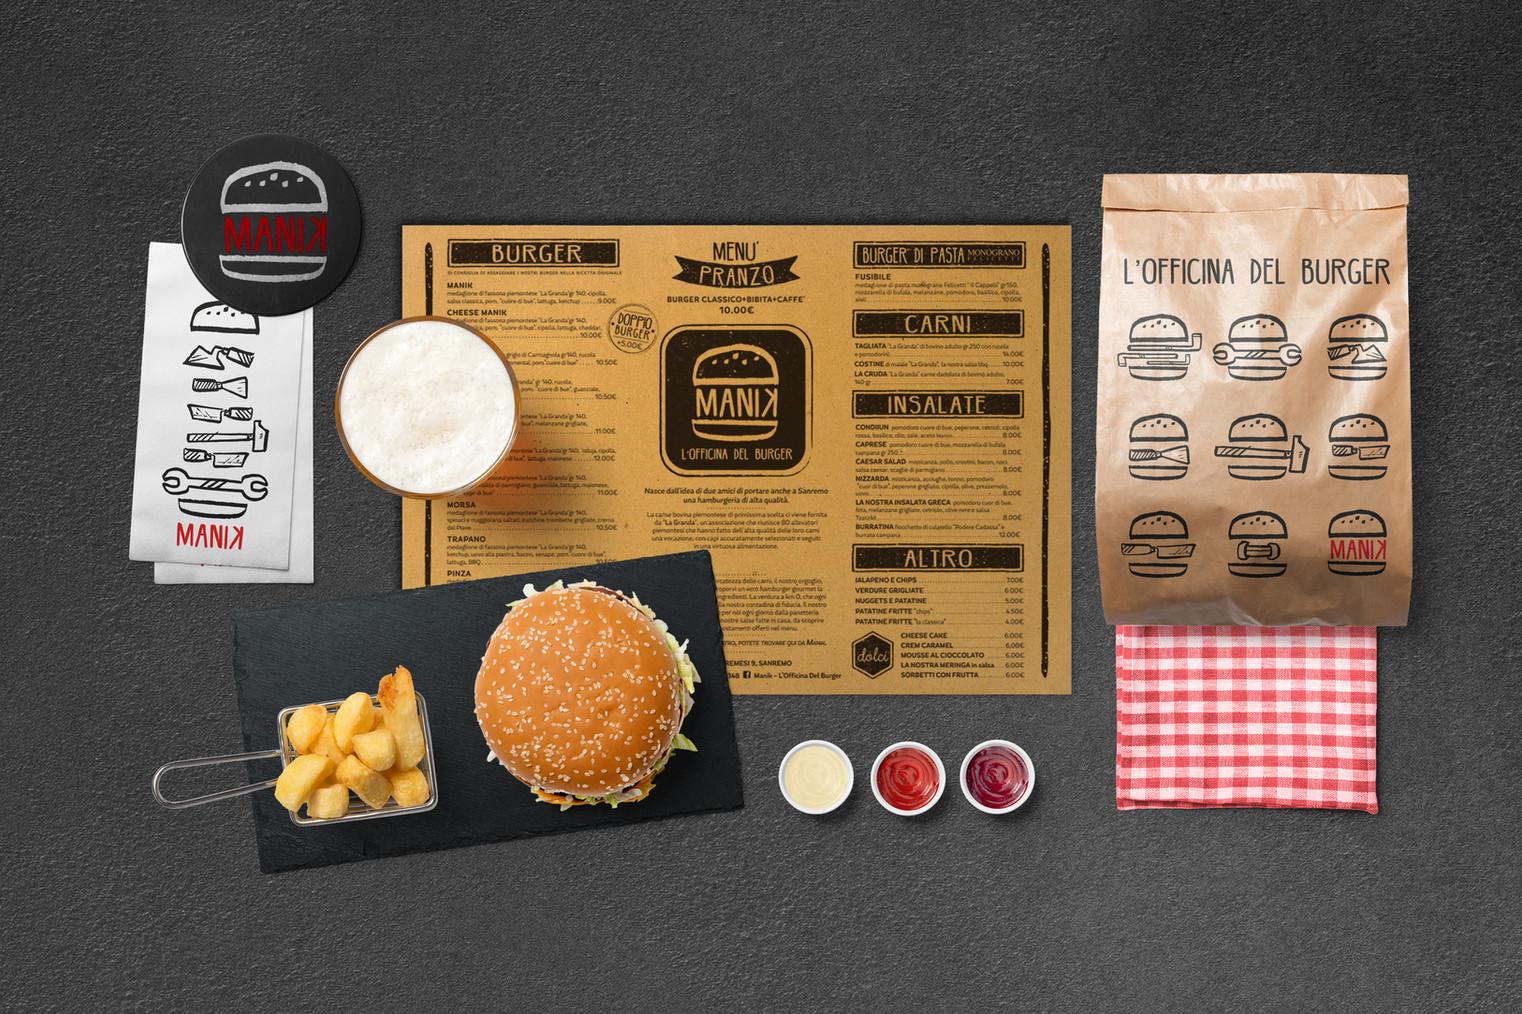 branding MANIK l'officina del burger, sanremo